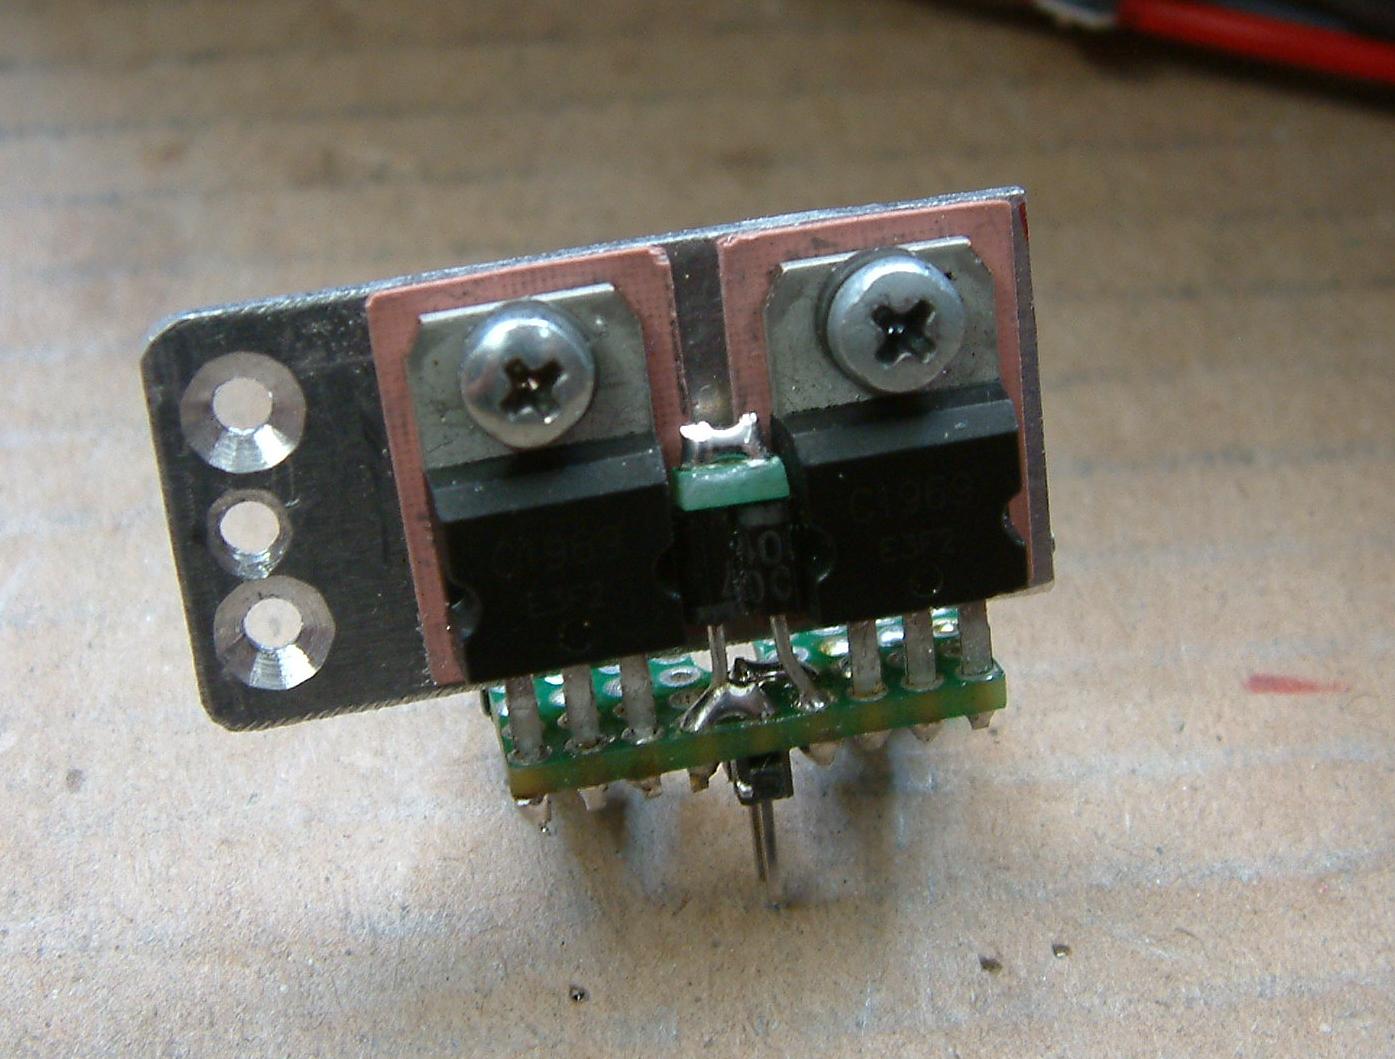 DK7IH Multiband QRP Transceiver for 5 Bands 2020 - Power transistors (2SC1969) on separate veroboard